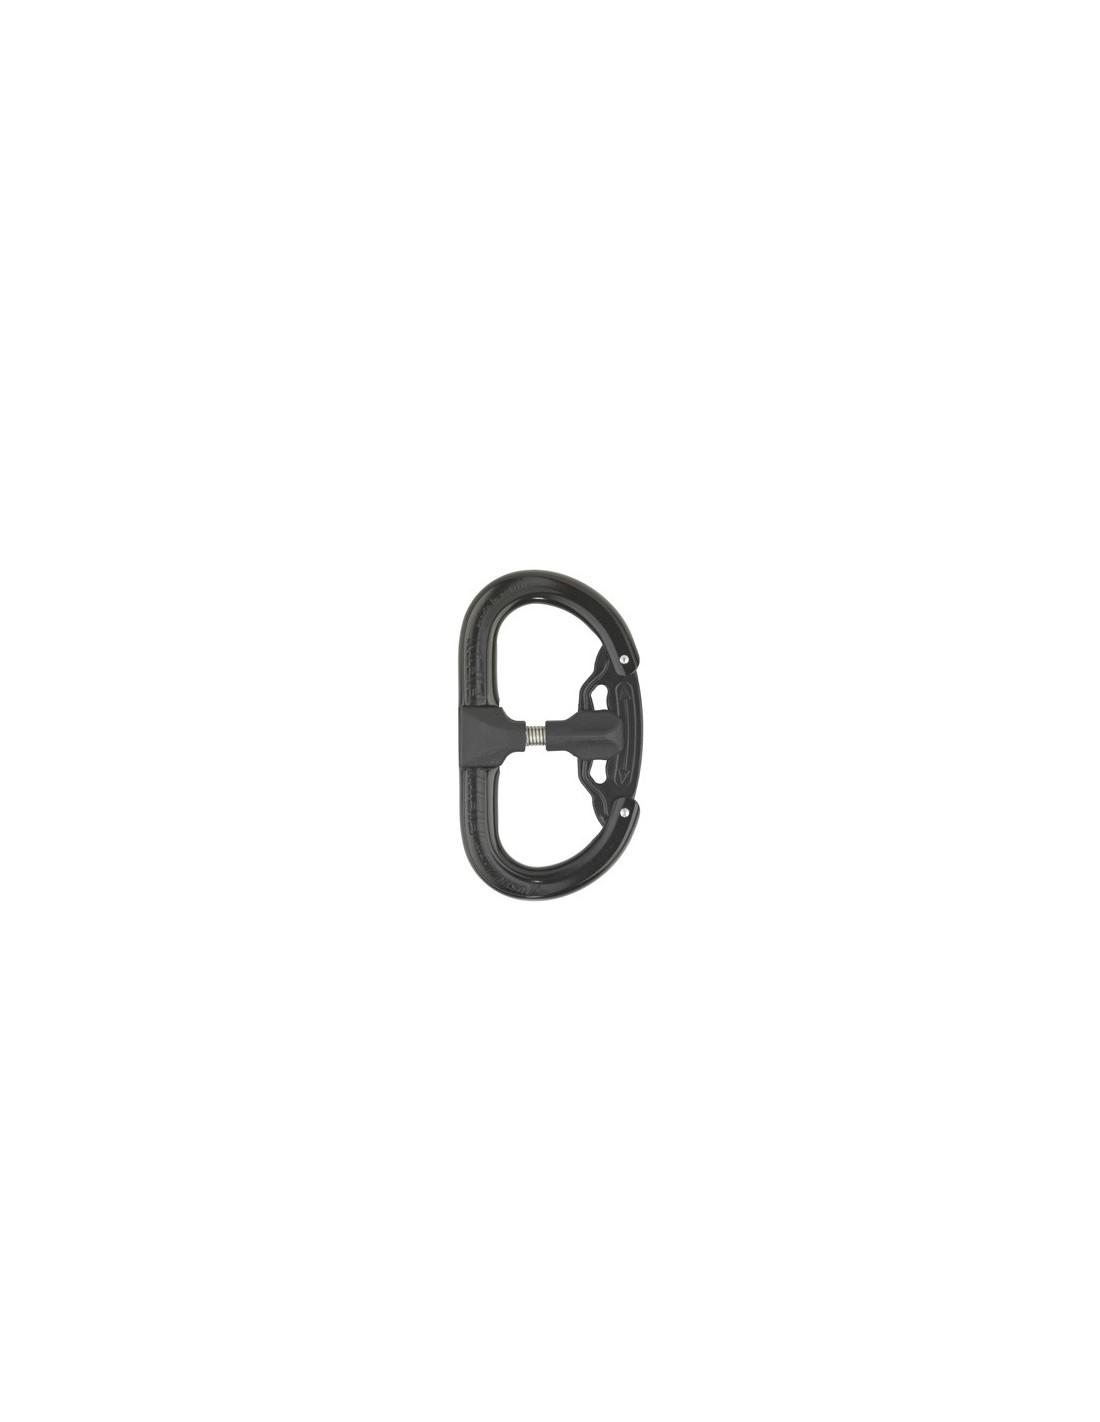 AustriAlpin FIFTY-FIFTY AutoLock, 2 Kammern, patentiert schwarz eloxiert Karabin